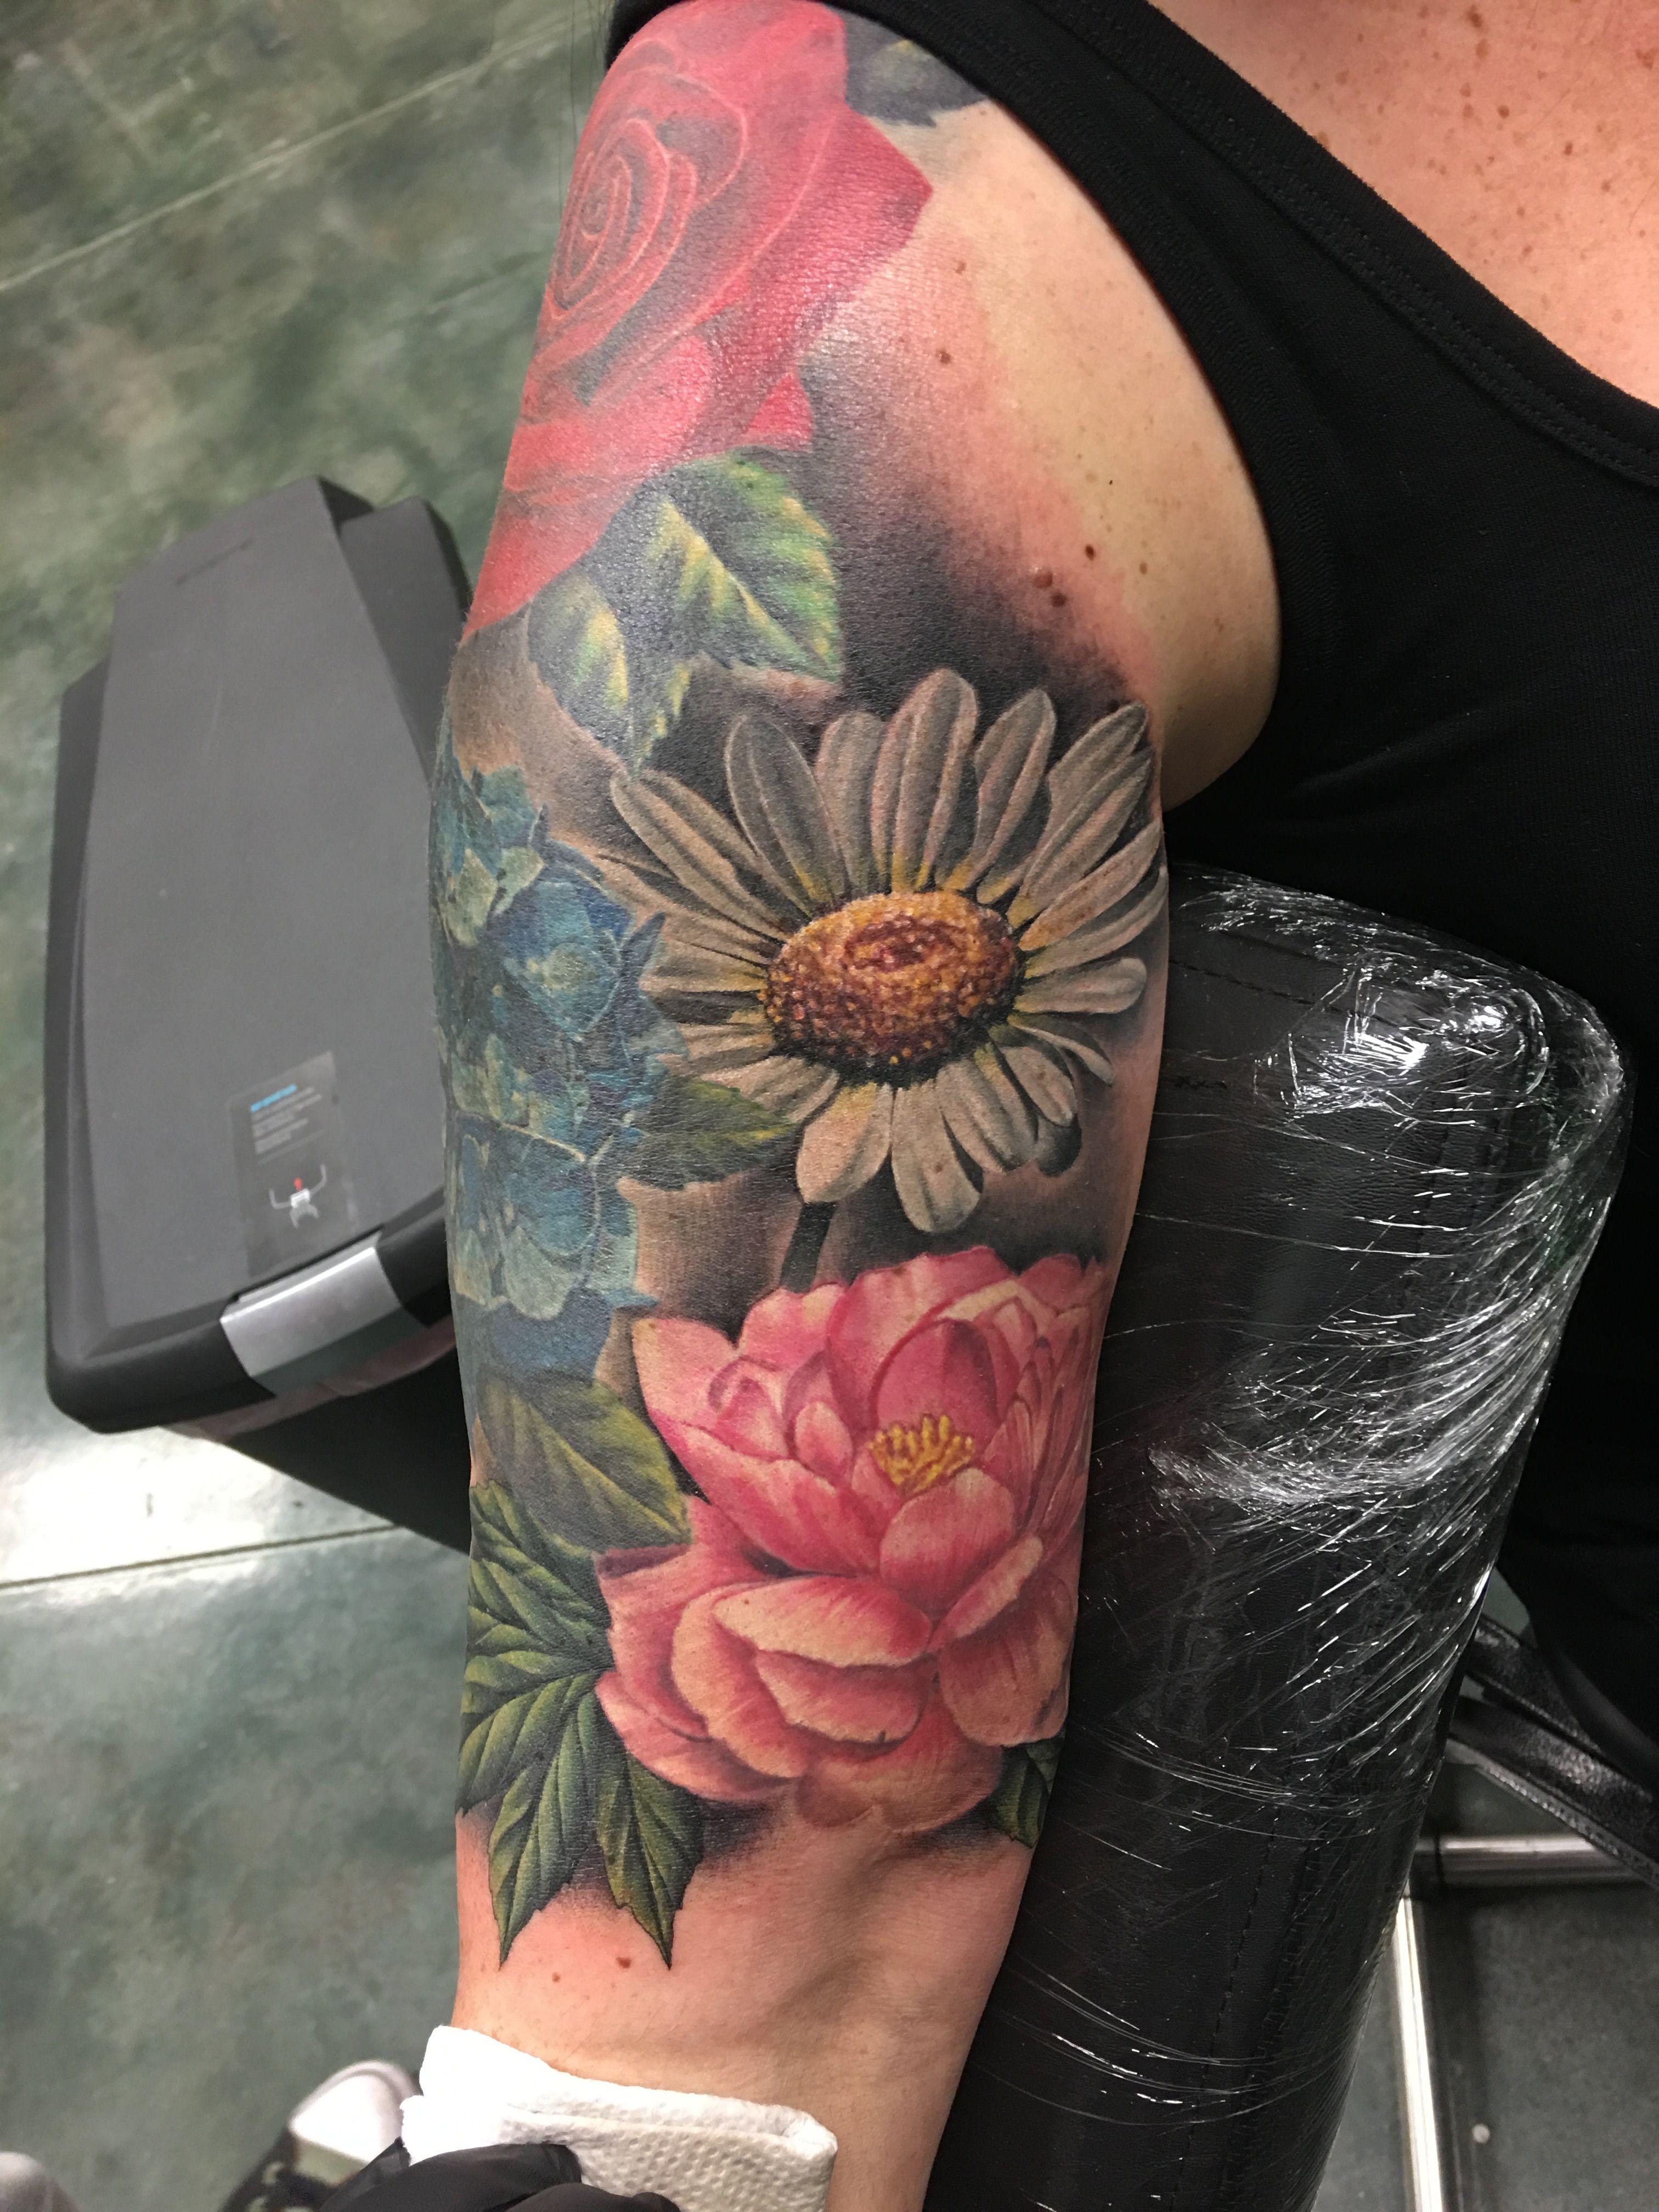 Seth Holmes tattoo, daisy, peony, hydrangea, rose, floral